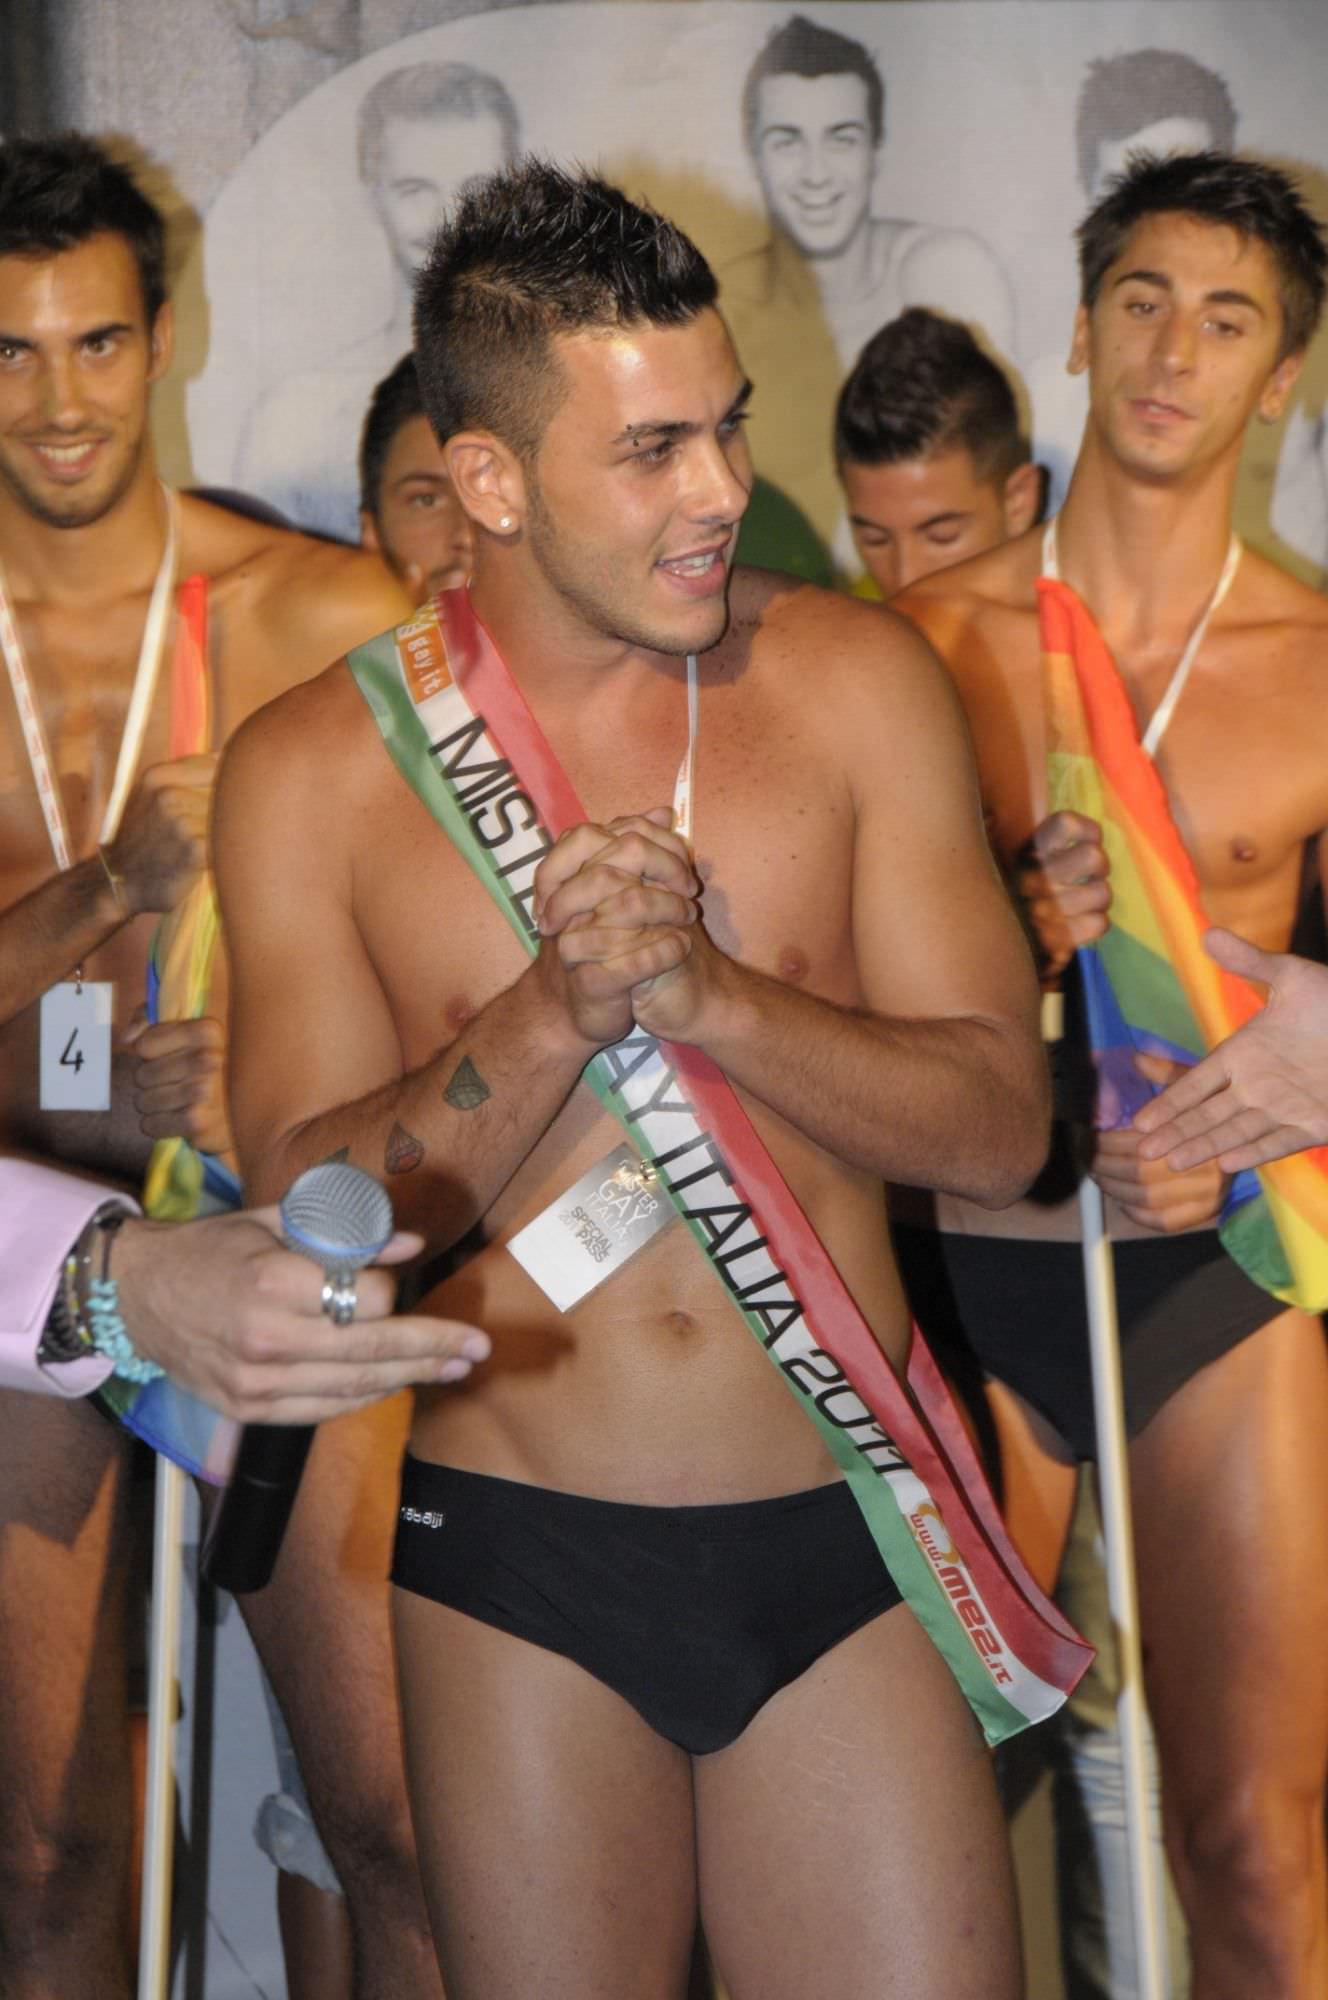 ghibli spogliarellista top gay italia